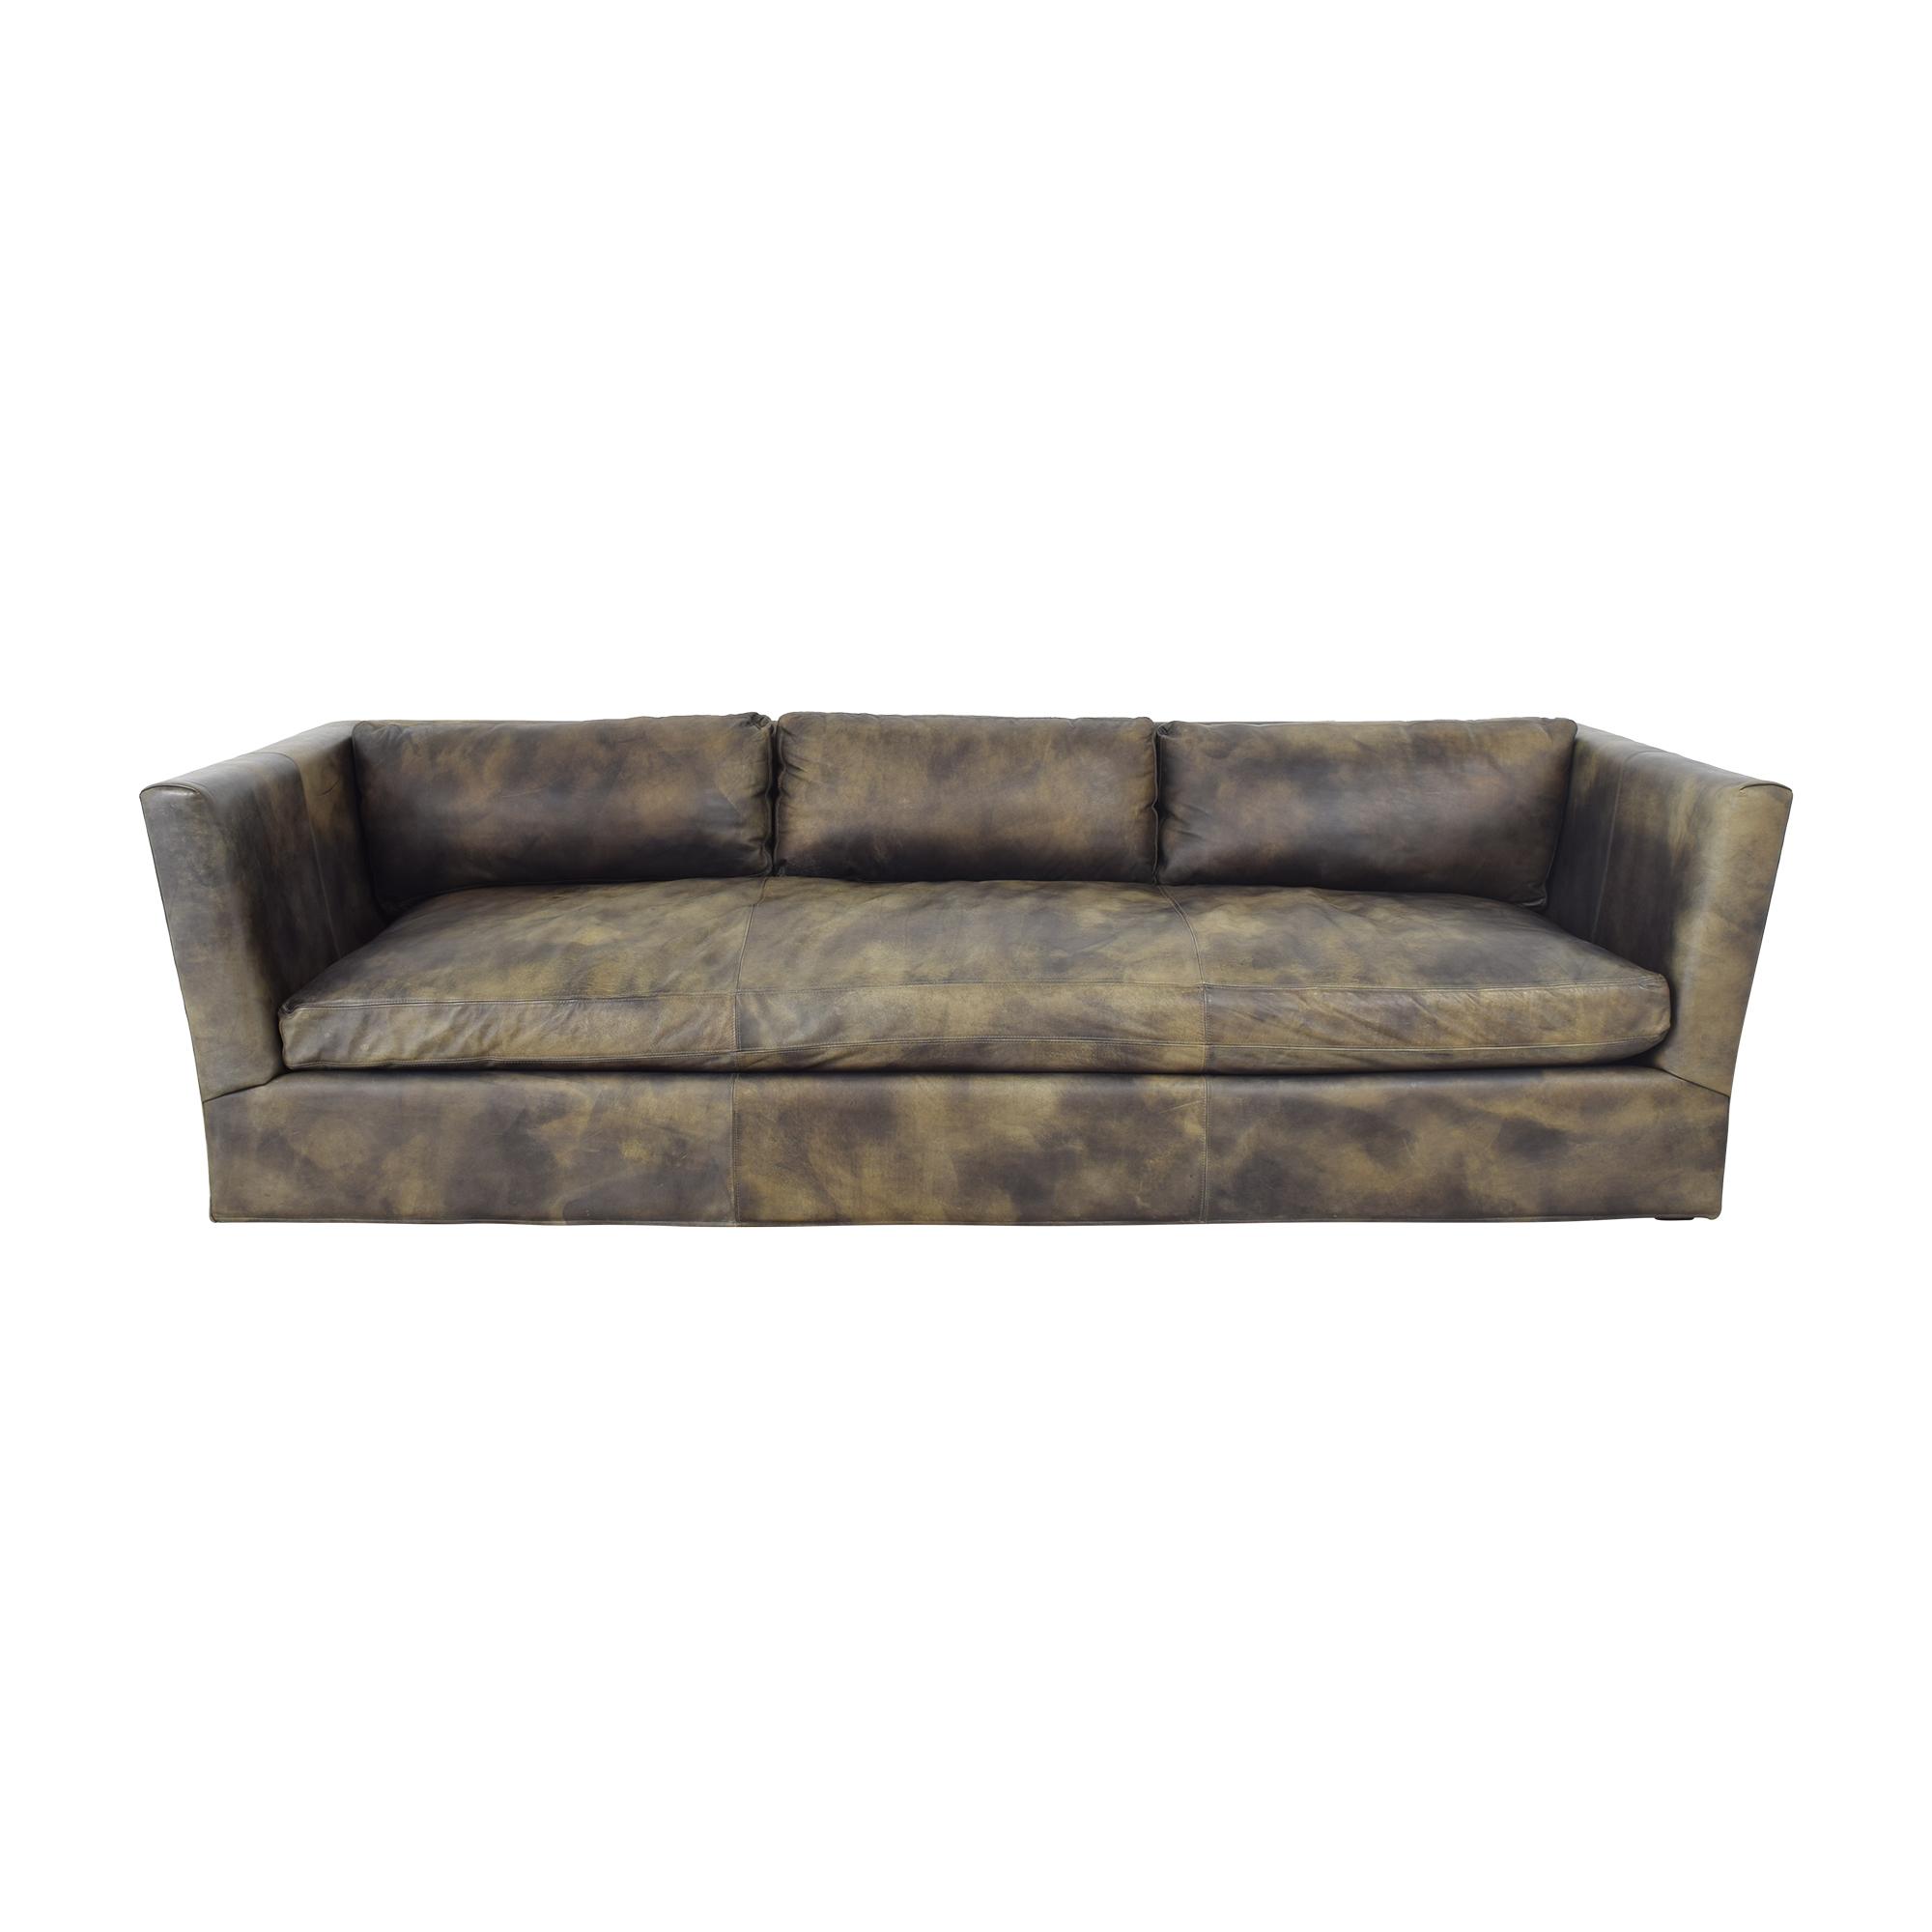 Restoration Hardware Restoration Hardware Custom Flared Arm Sofa price